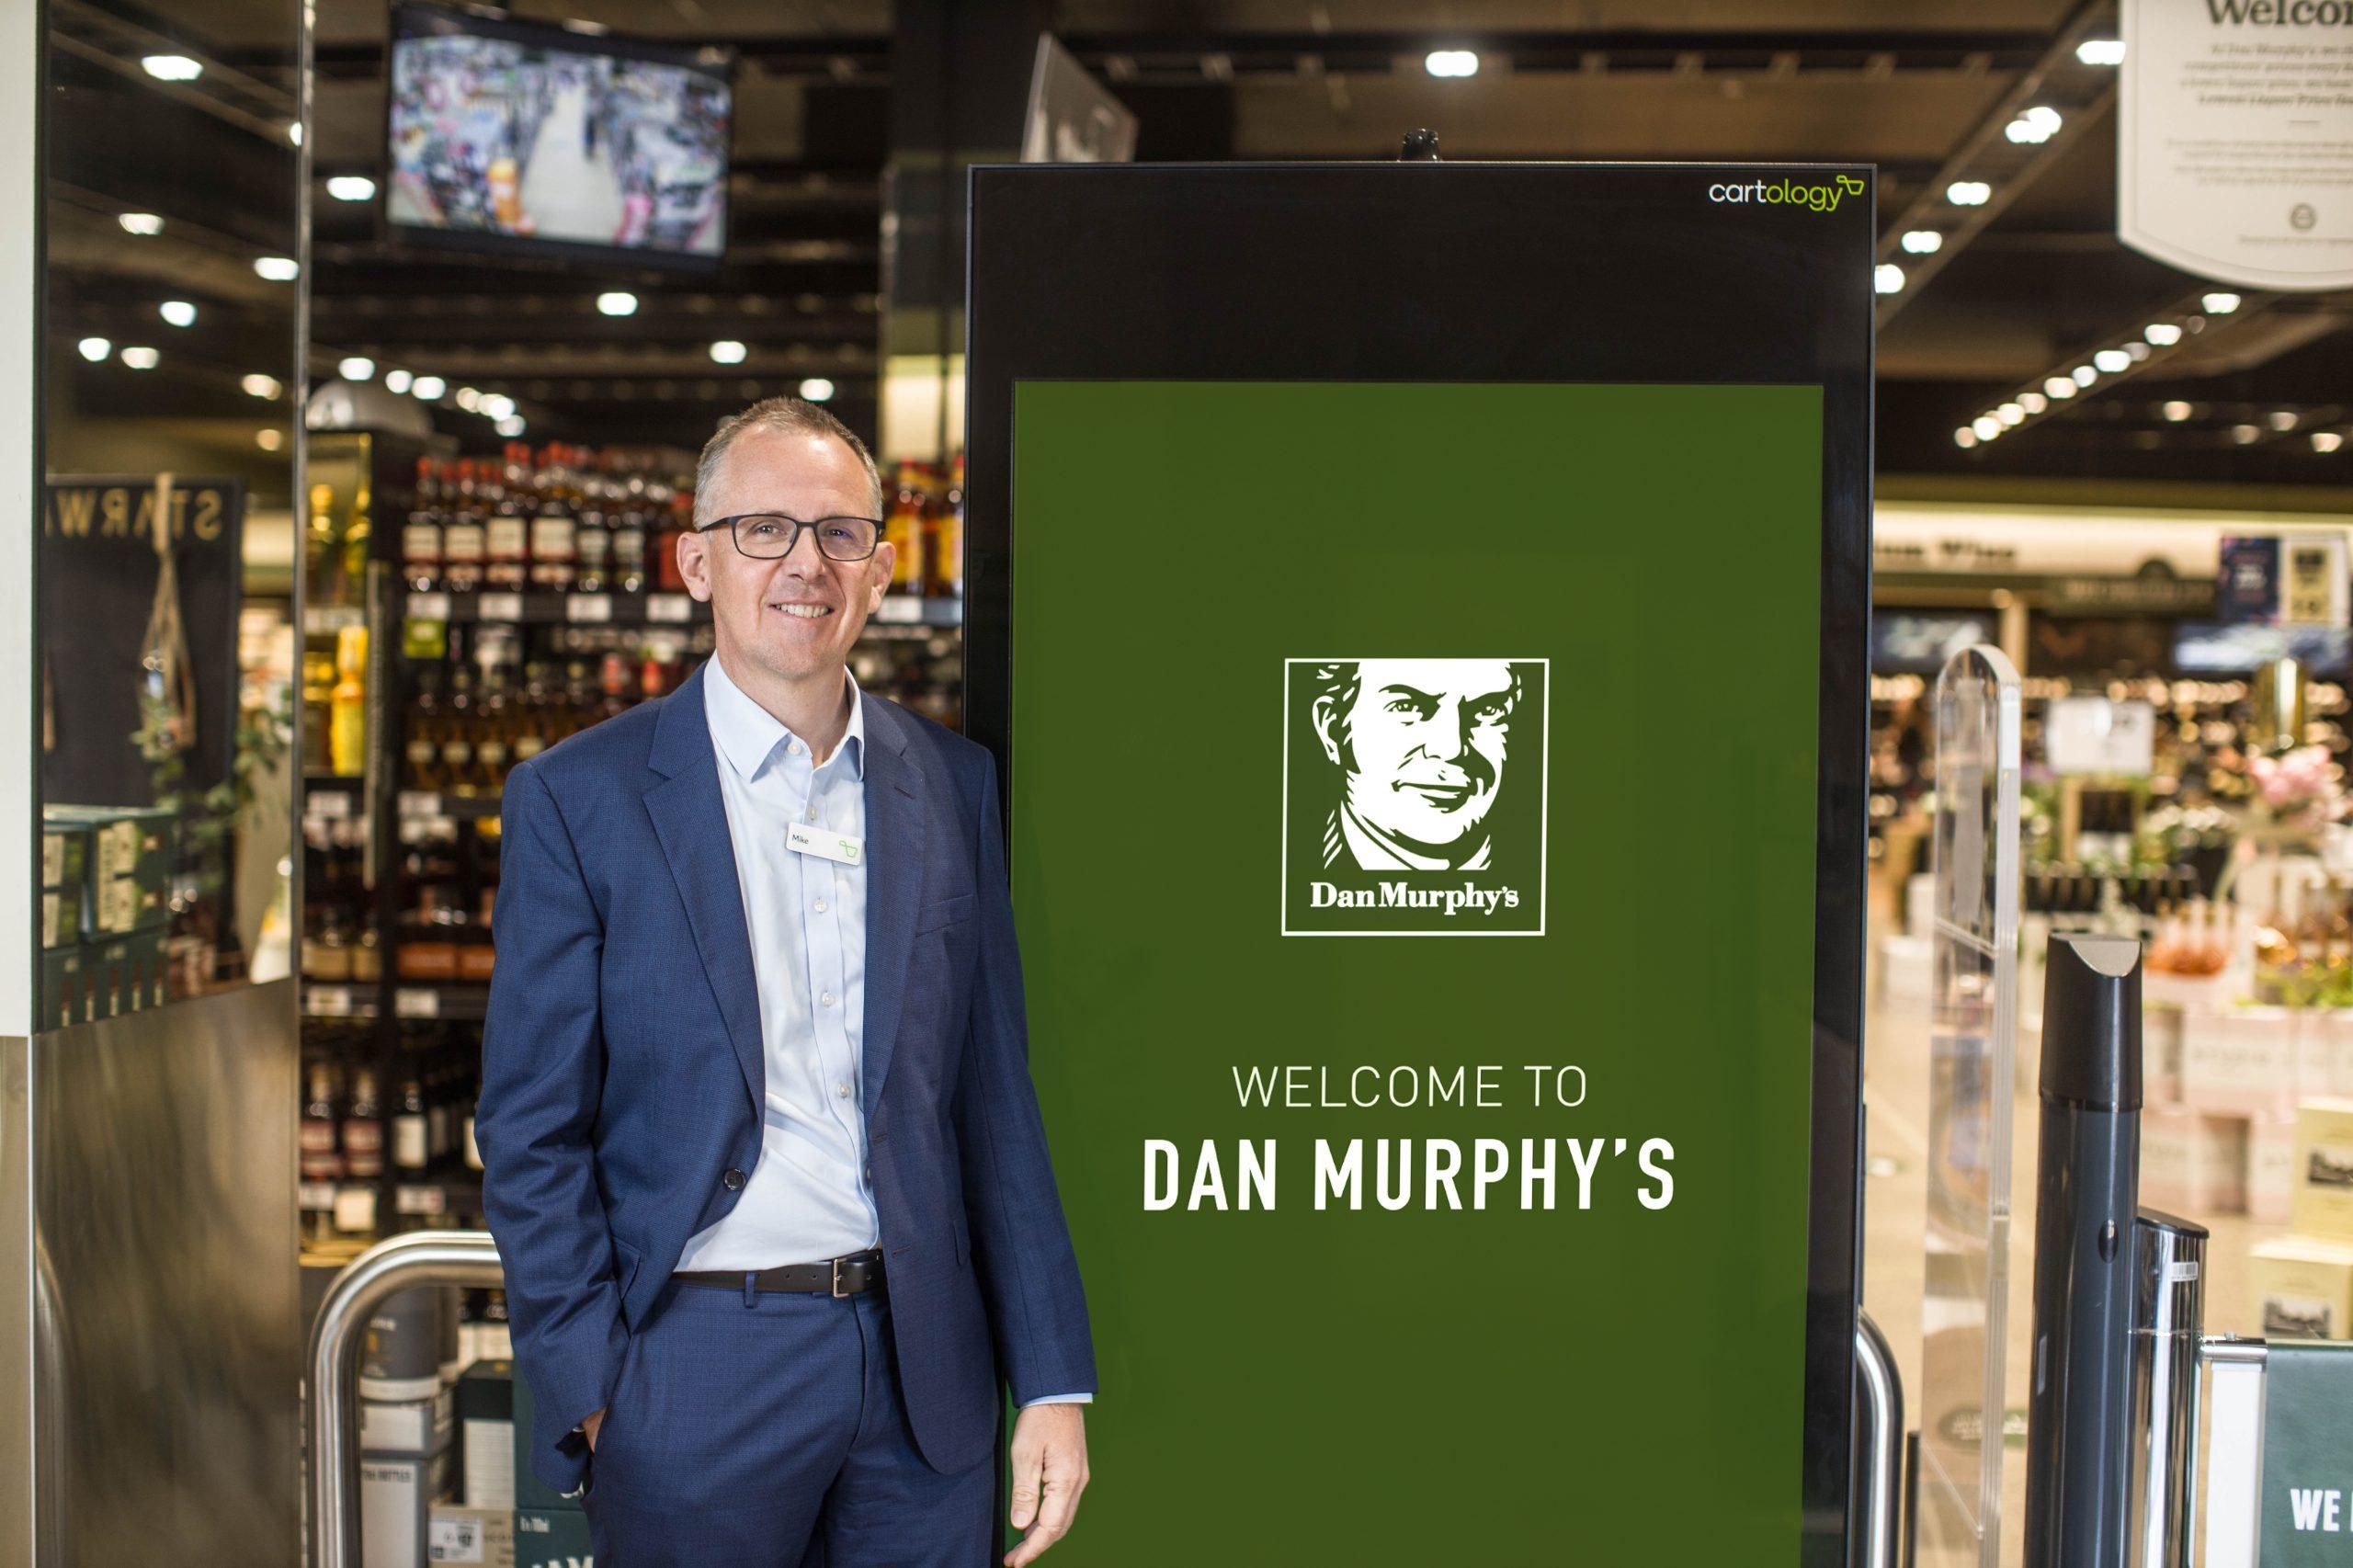 Woolworths' Cartology Brings New Digital Screens To Dan Murphy's Stores